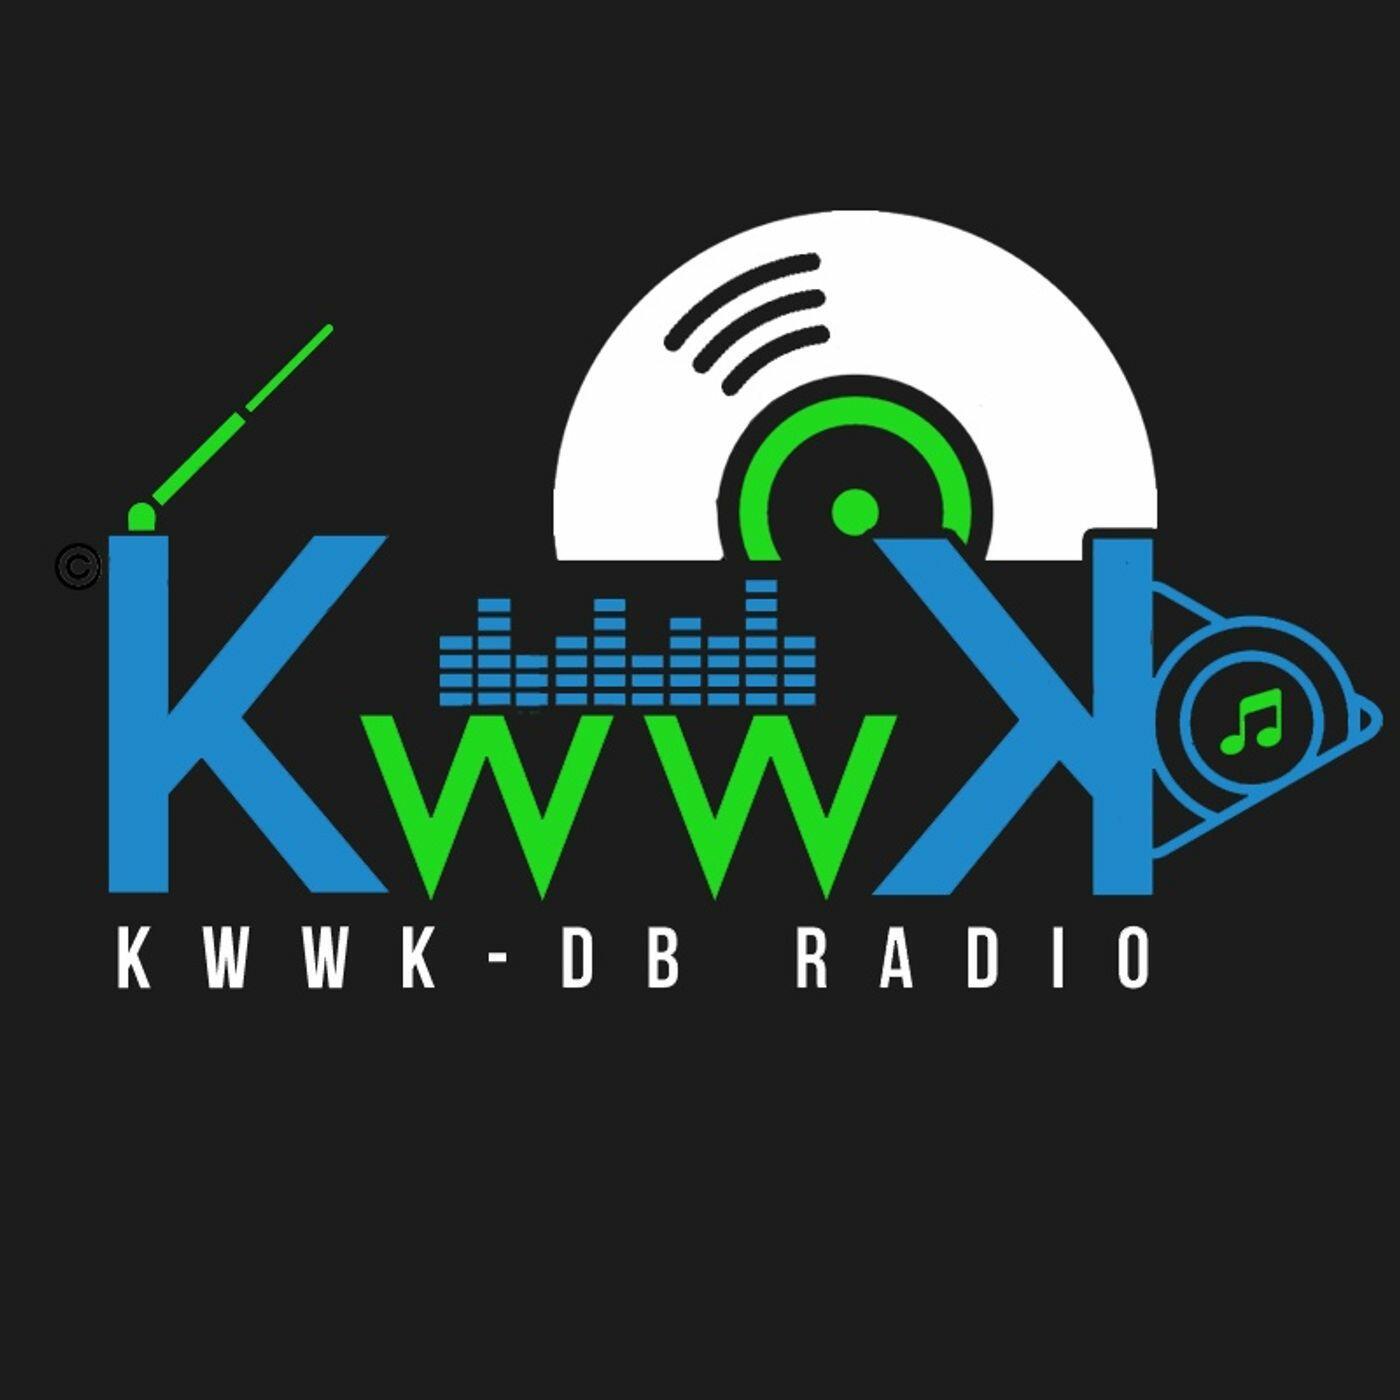 KWWK-DB RADIO